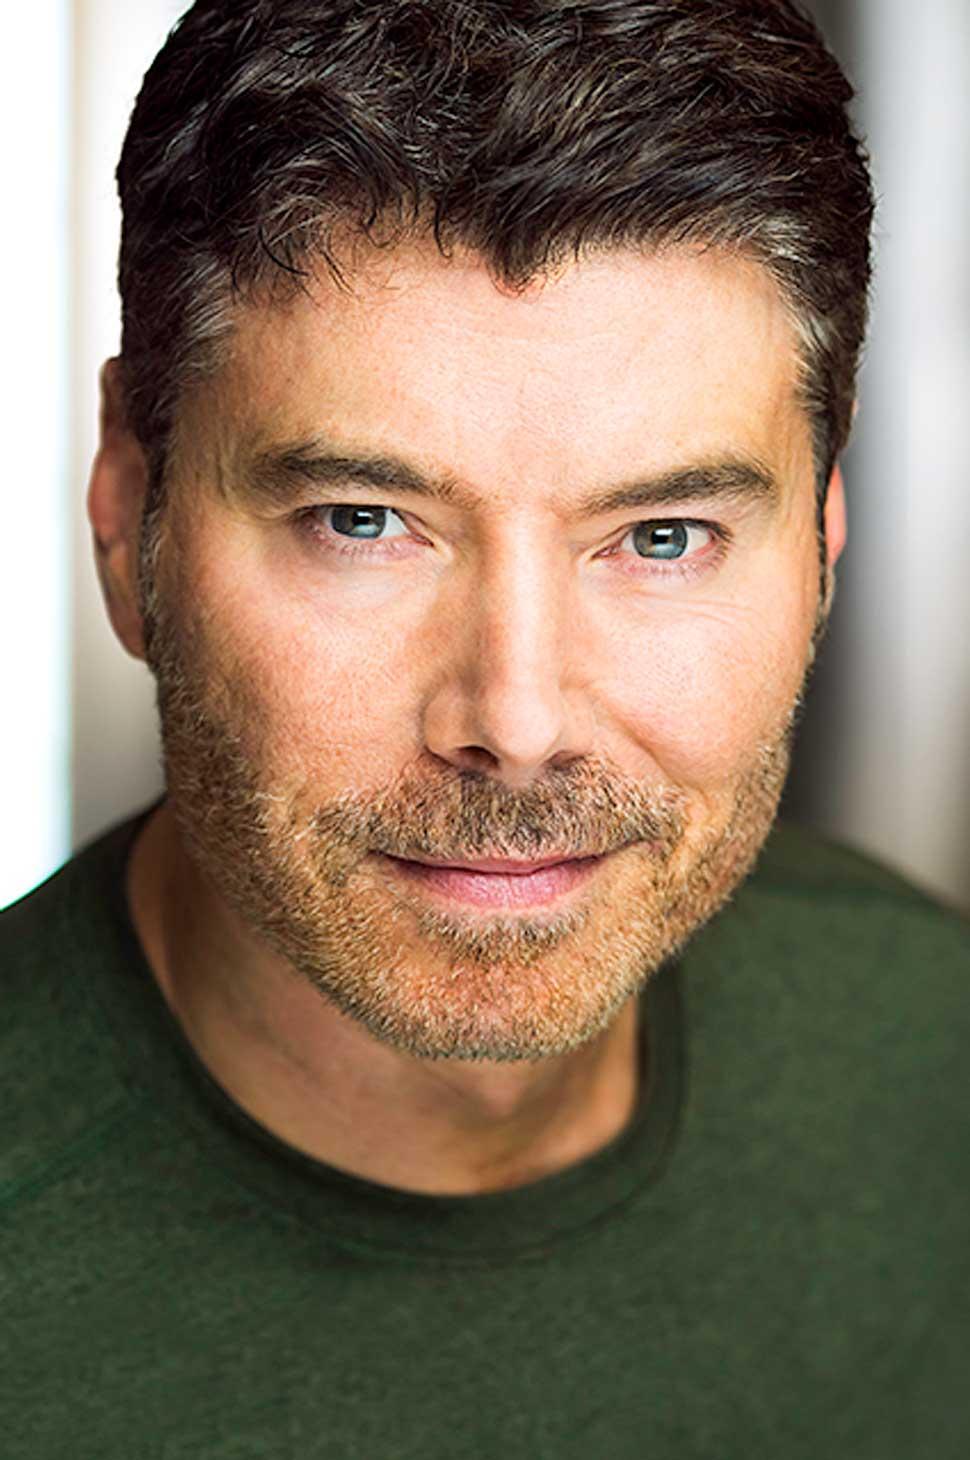 Benjamin Dane - Actor Action Thriller Headshot